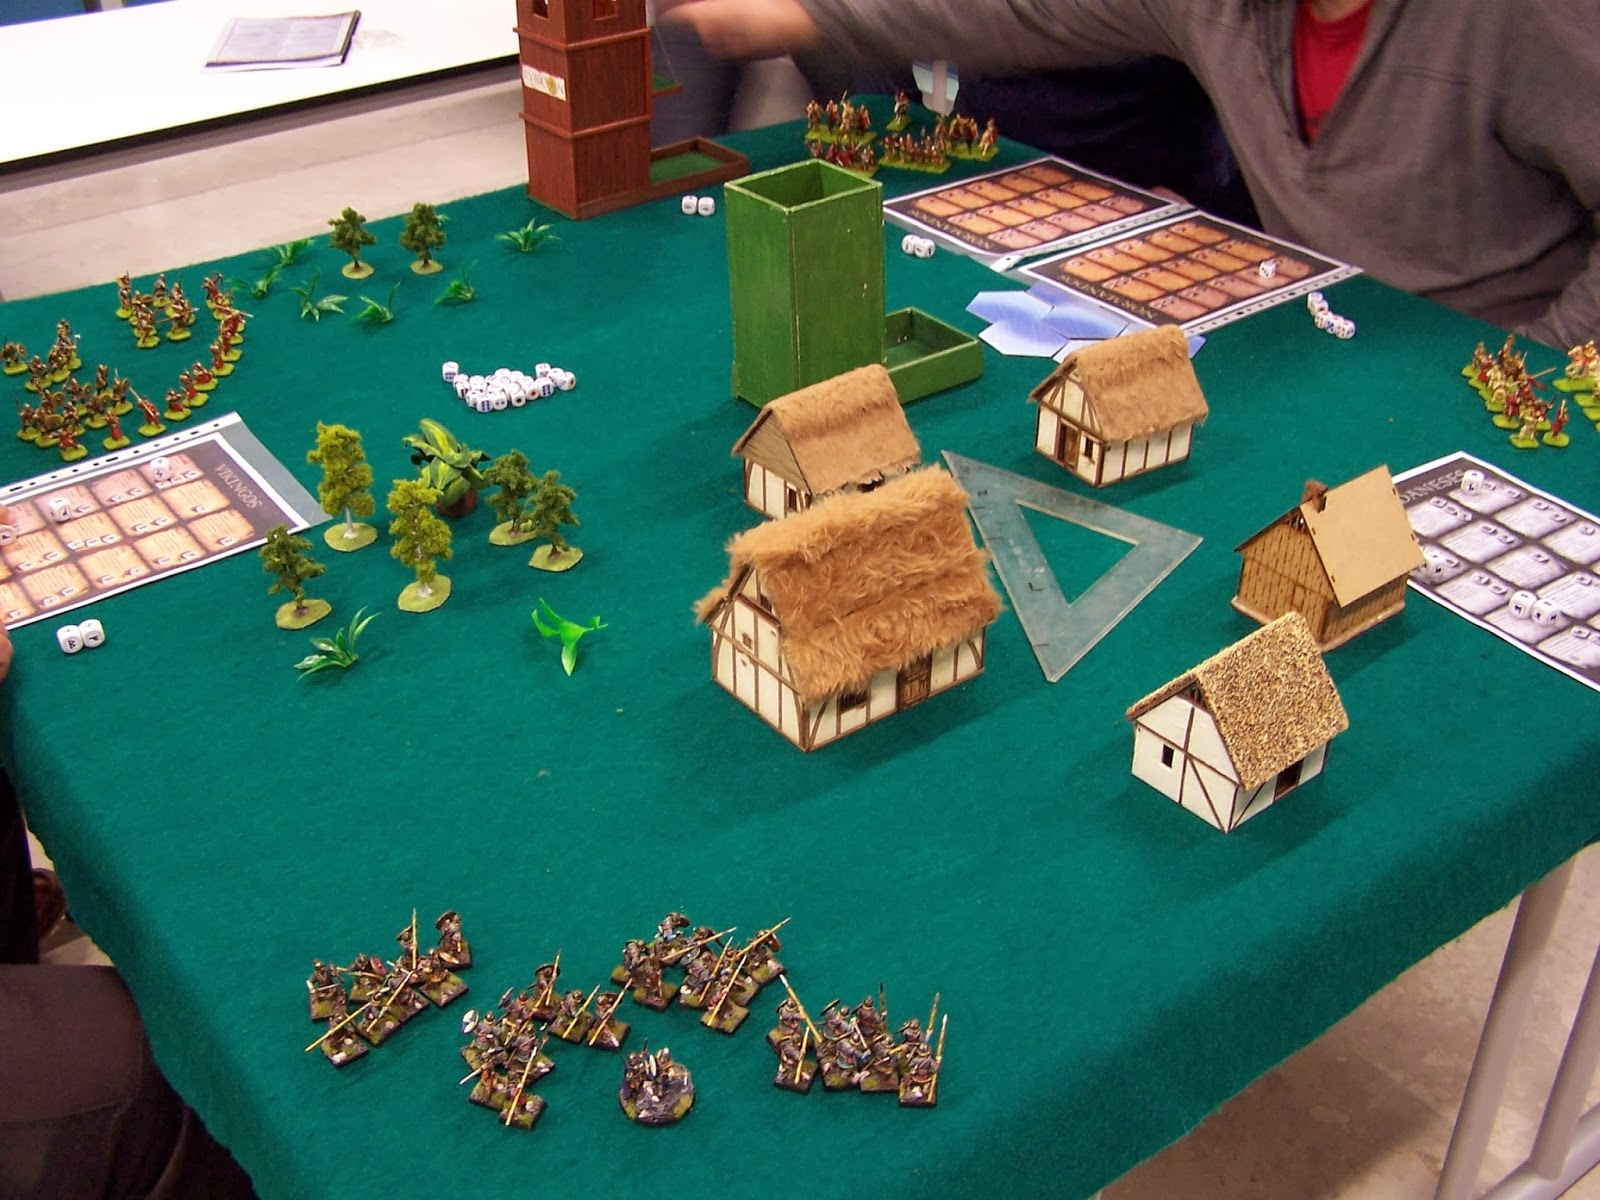 Horyminiaturas fest n de cuervos probando el saga a for Starcraft juego de mesa